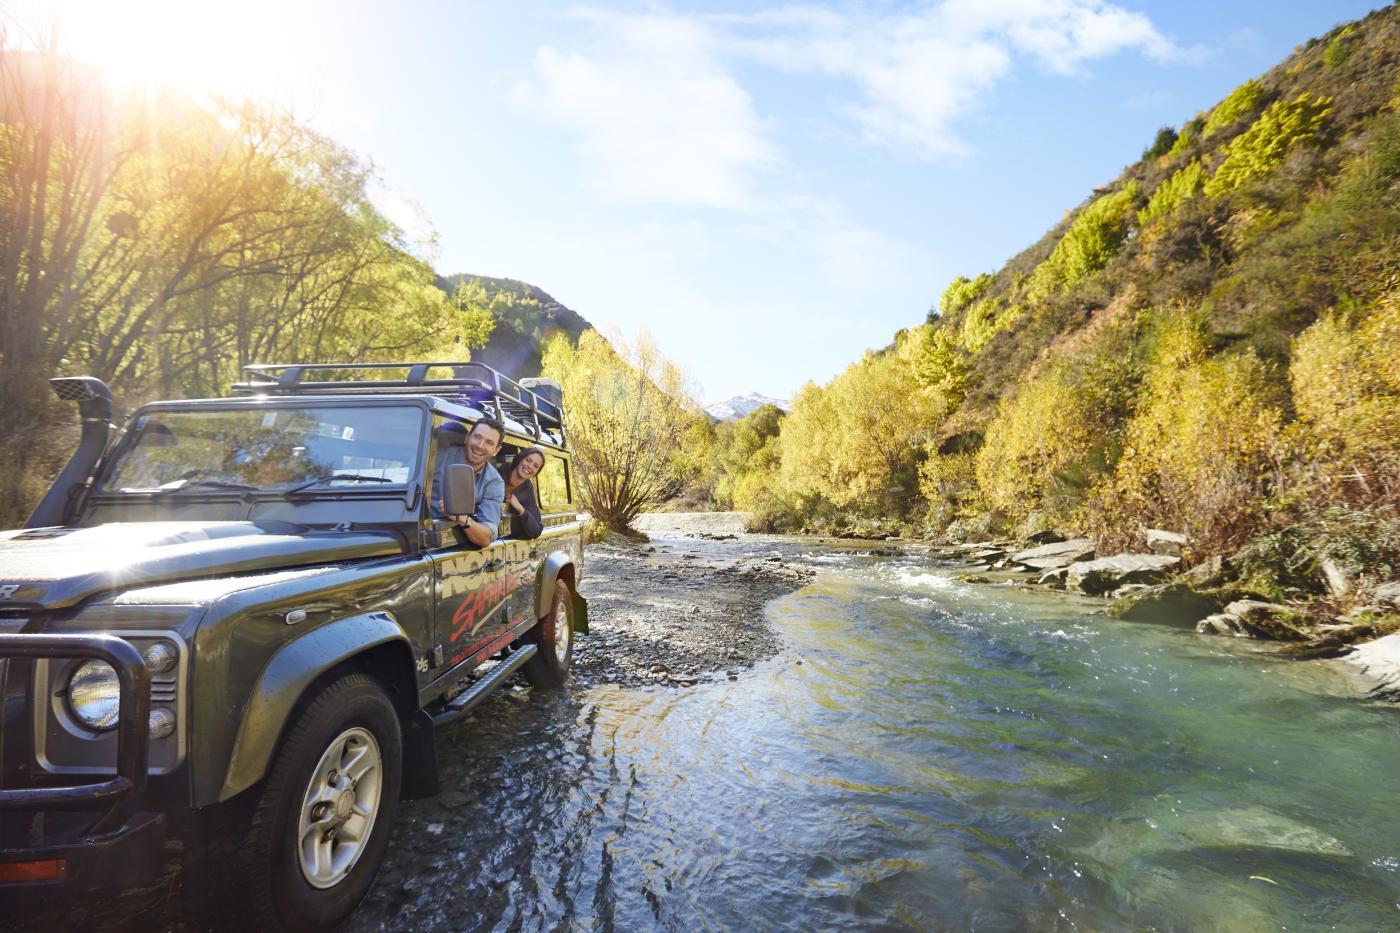 Nomad Safaris truck crossing river in Autumn